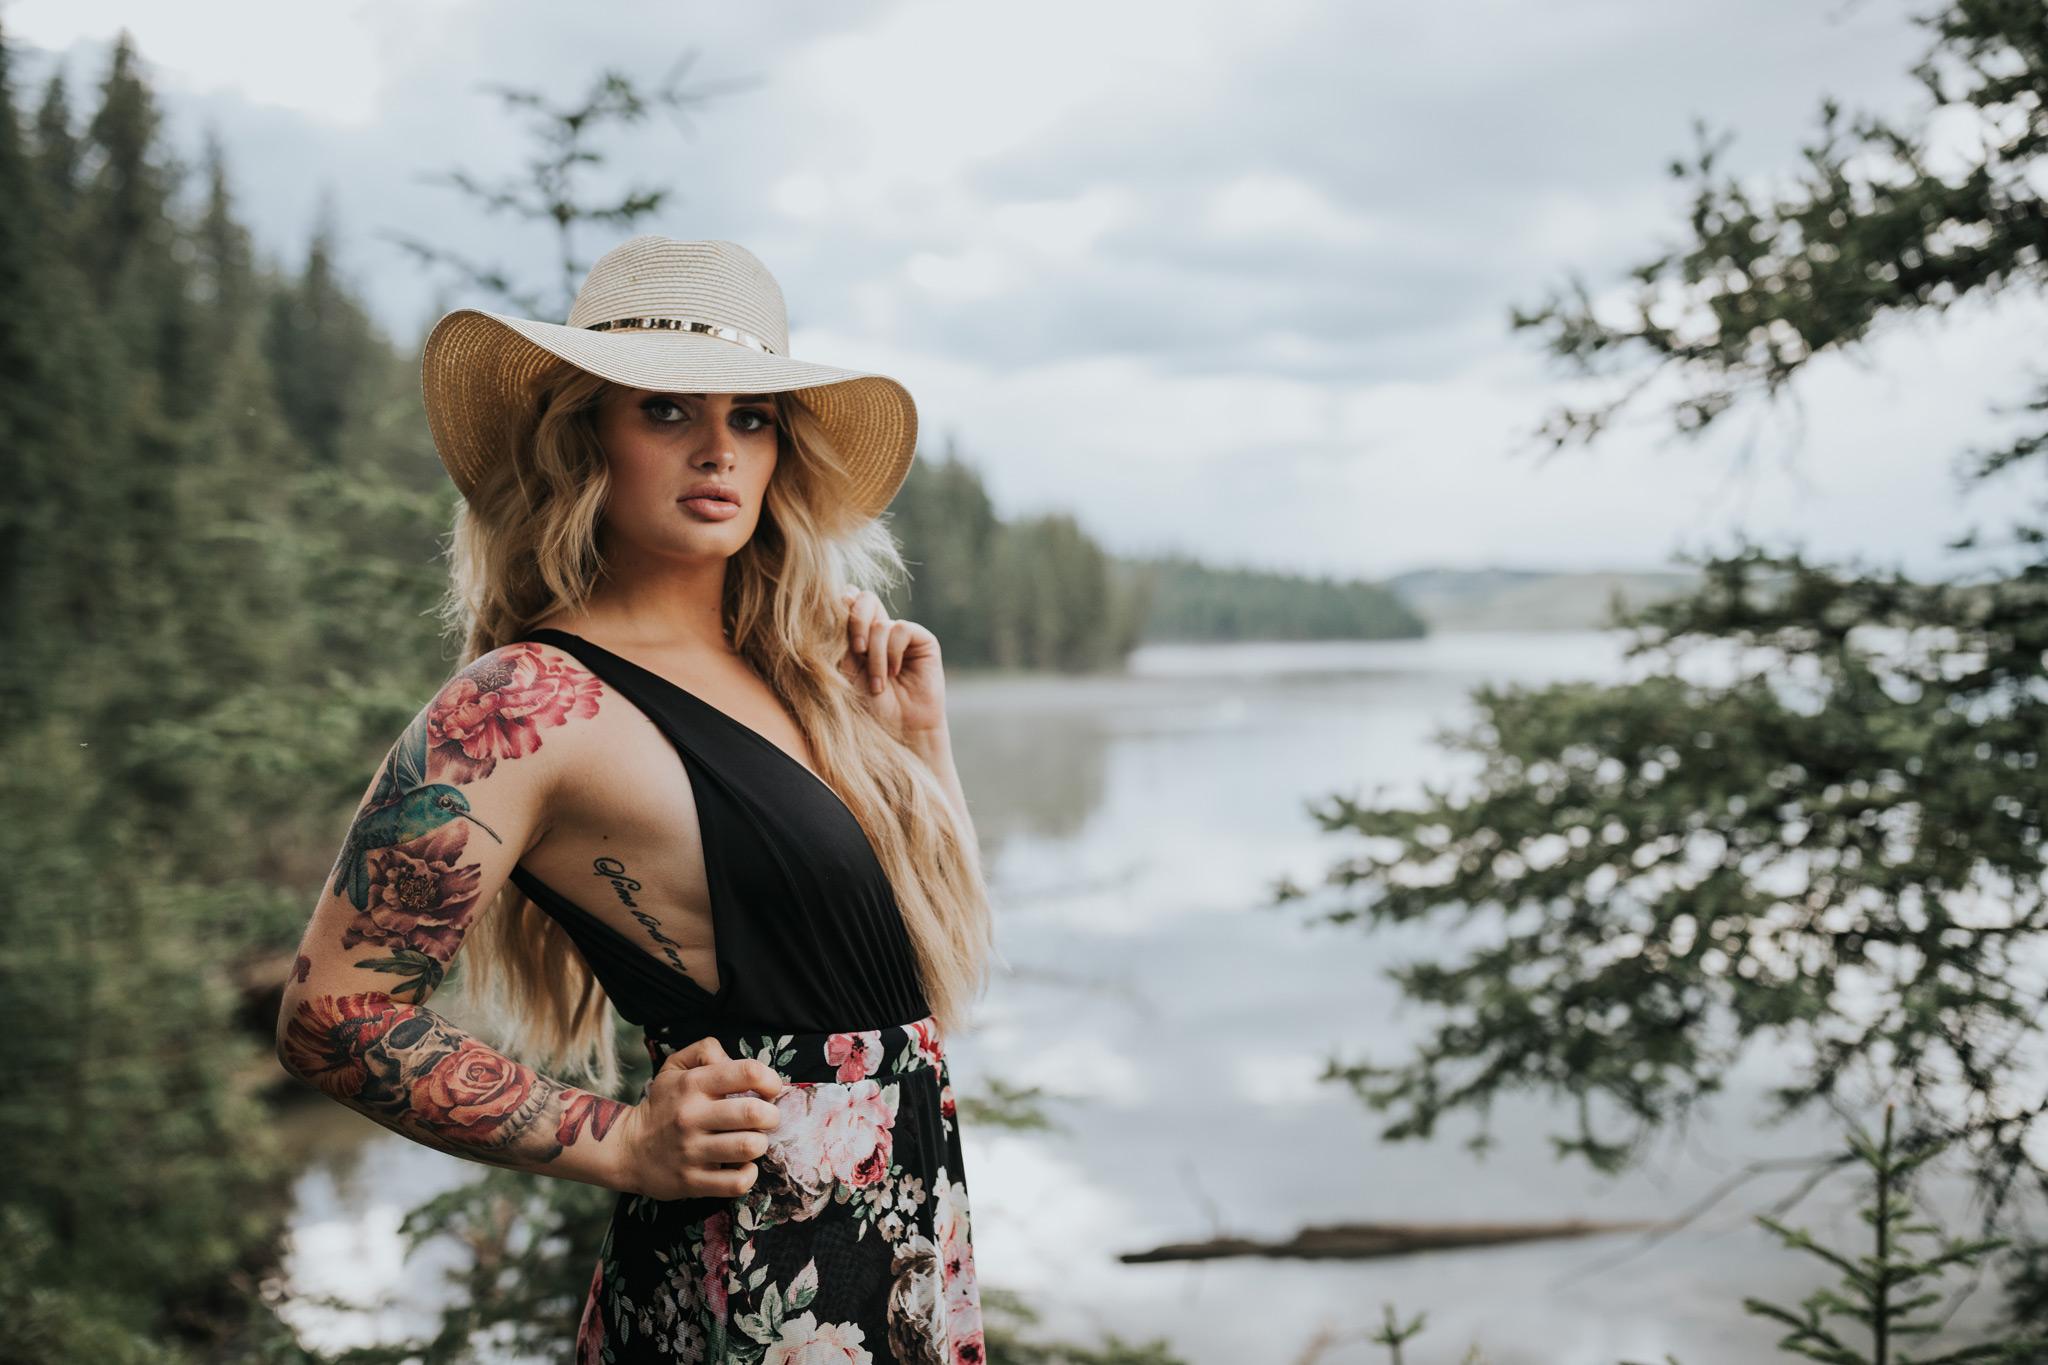 woman standing by reesor lake wearing floppy hat